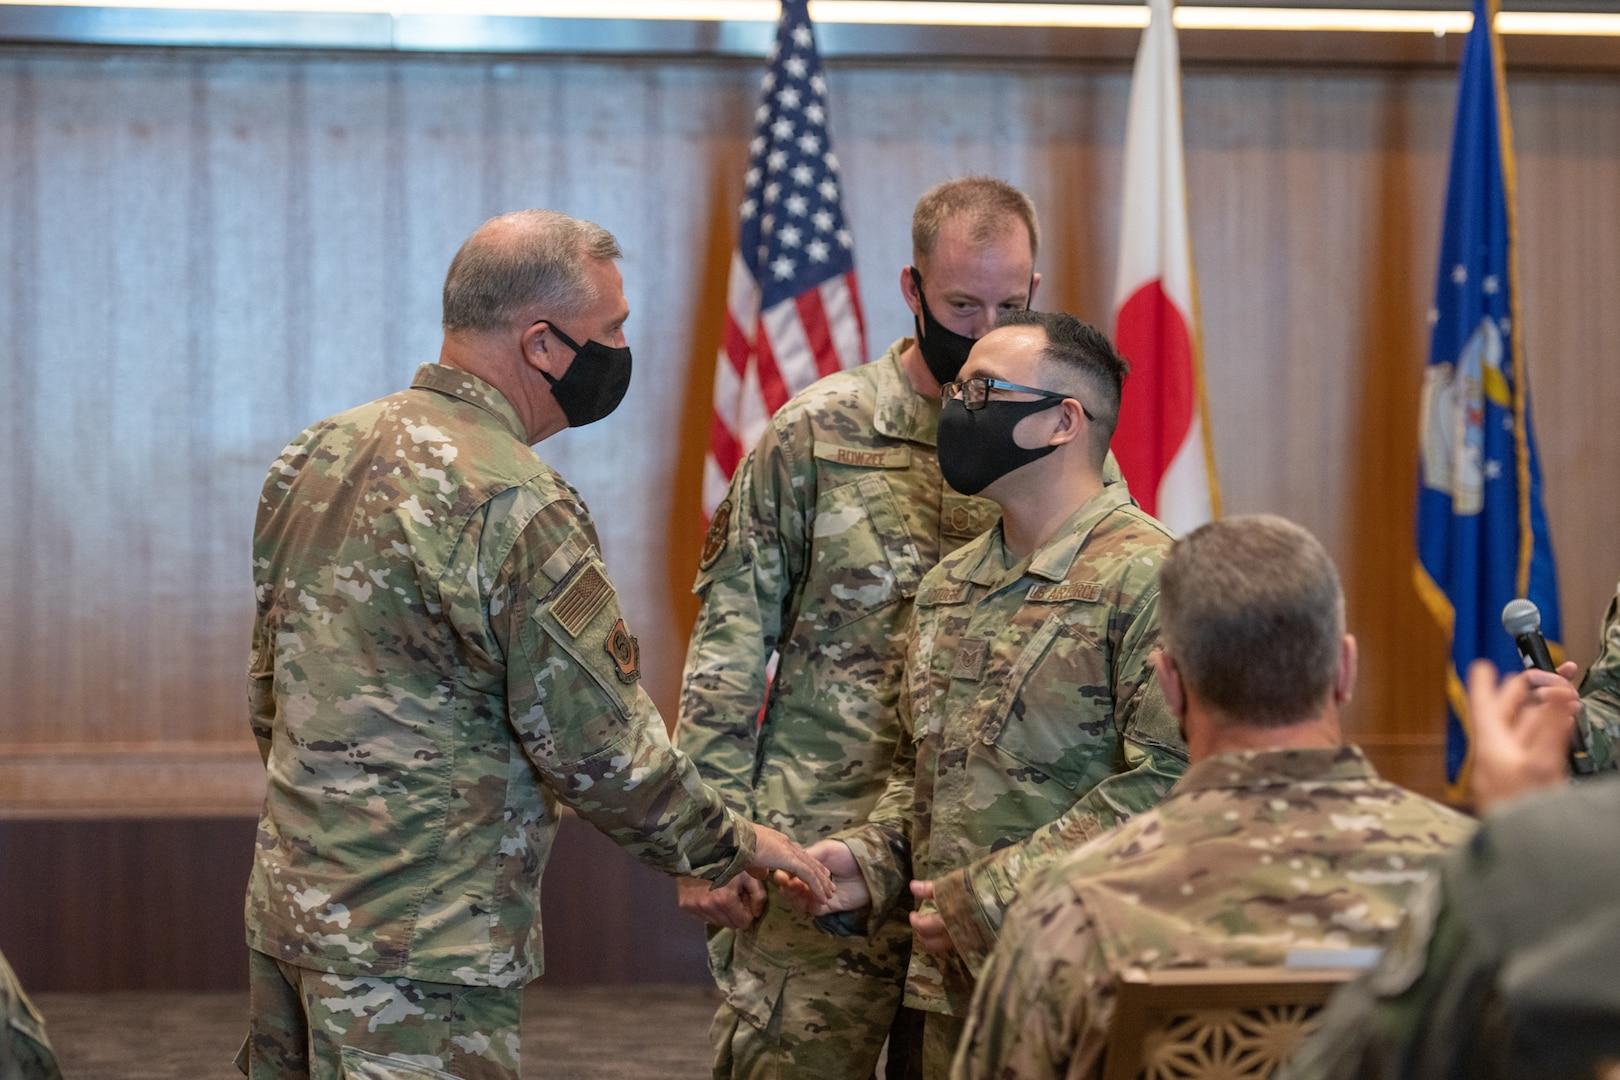 USFJ, 5th Air Force commander visits Kadena